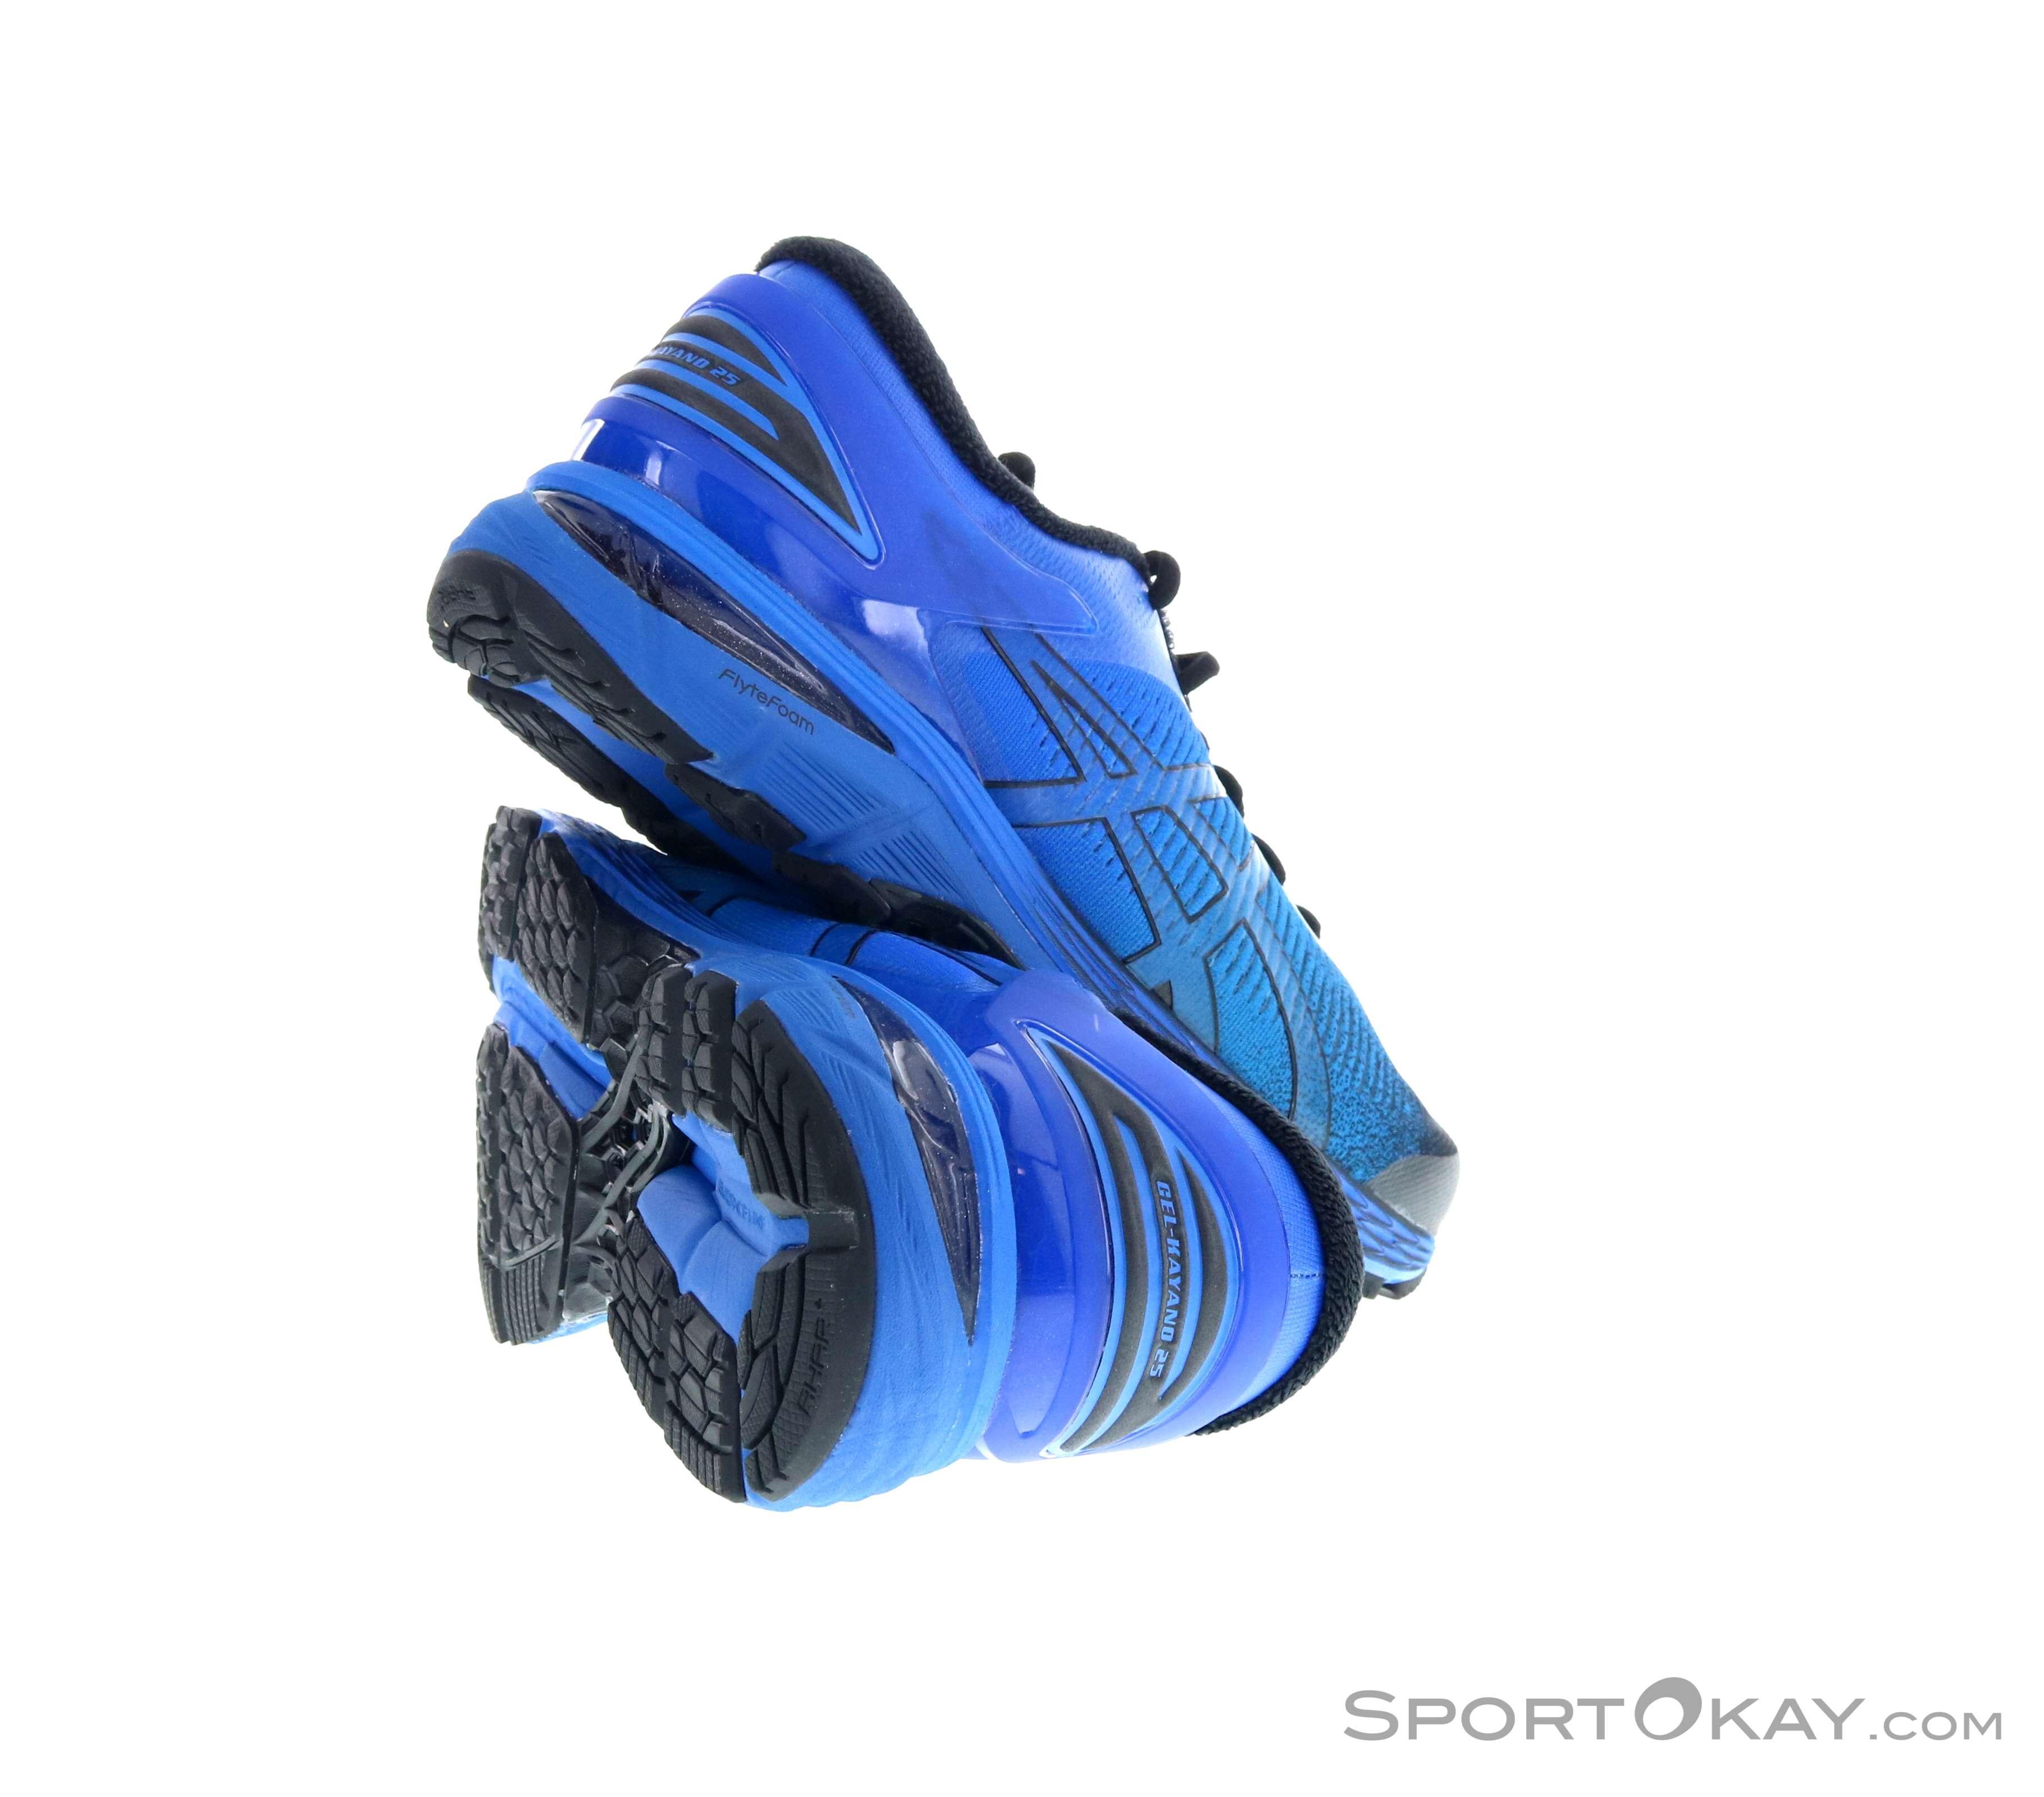 finest selection 78f88 032d5 Asics Asics Gel Kayano 25 SP Mens Running Shoes